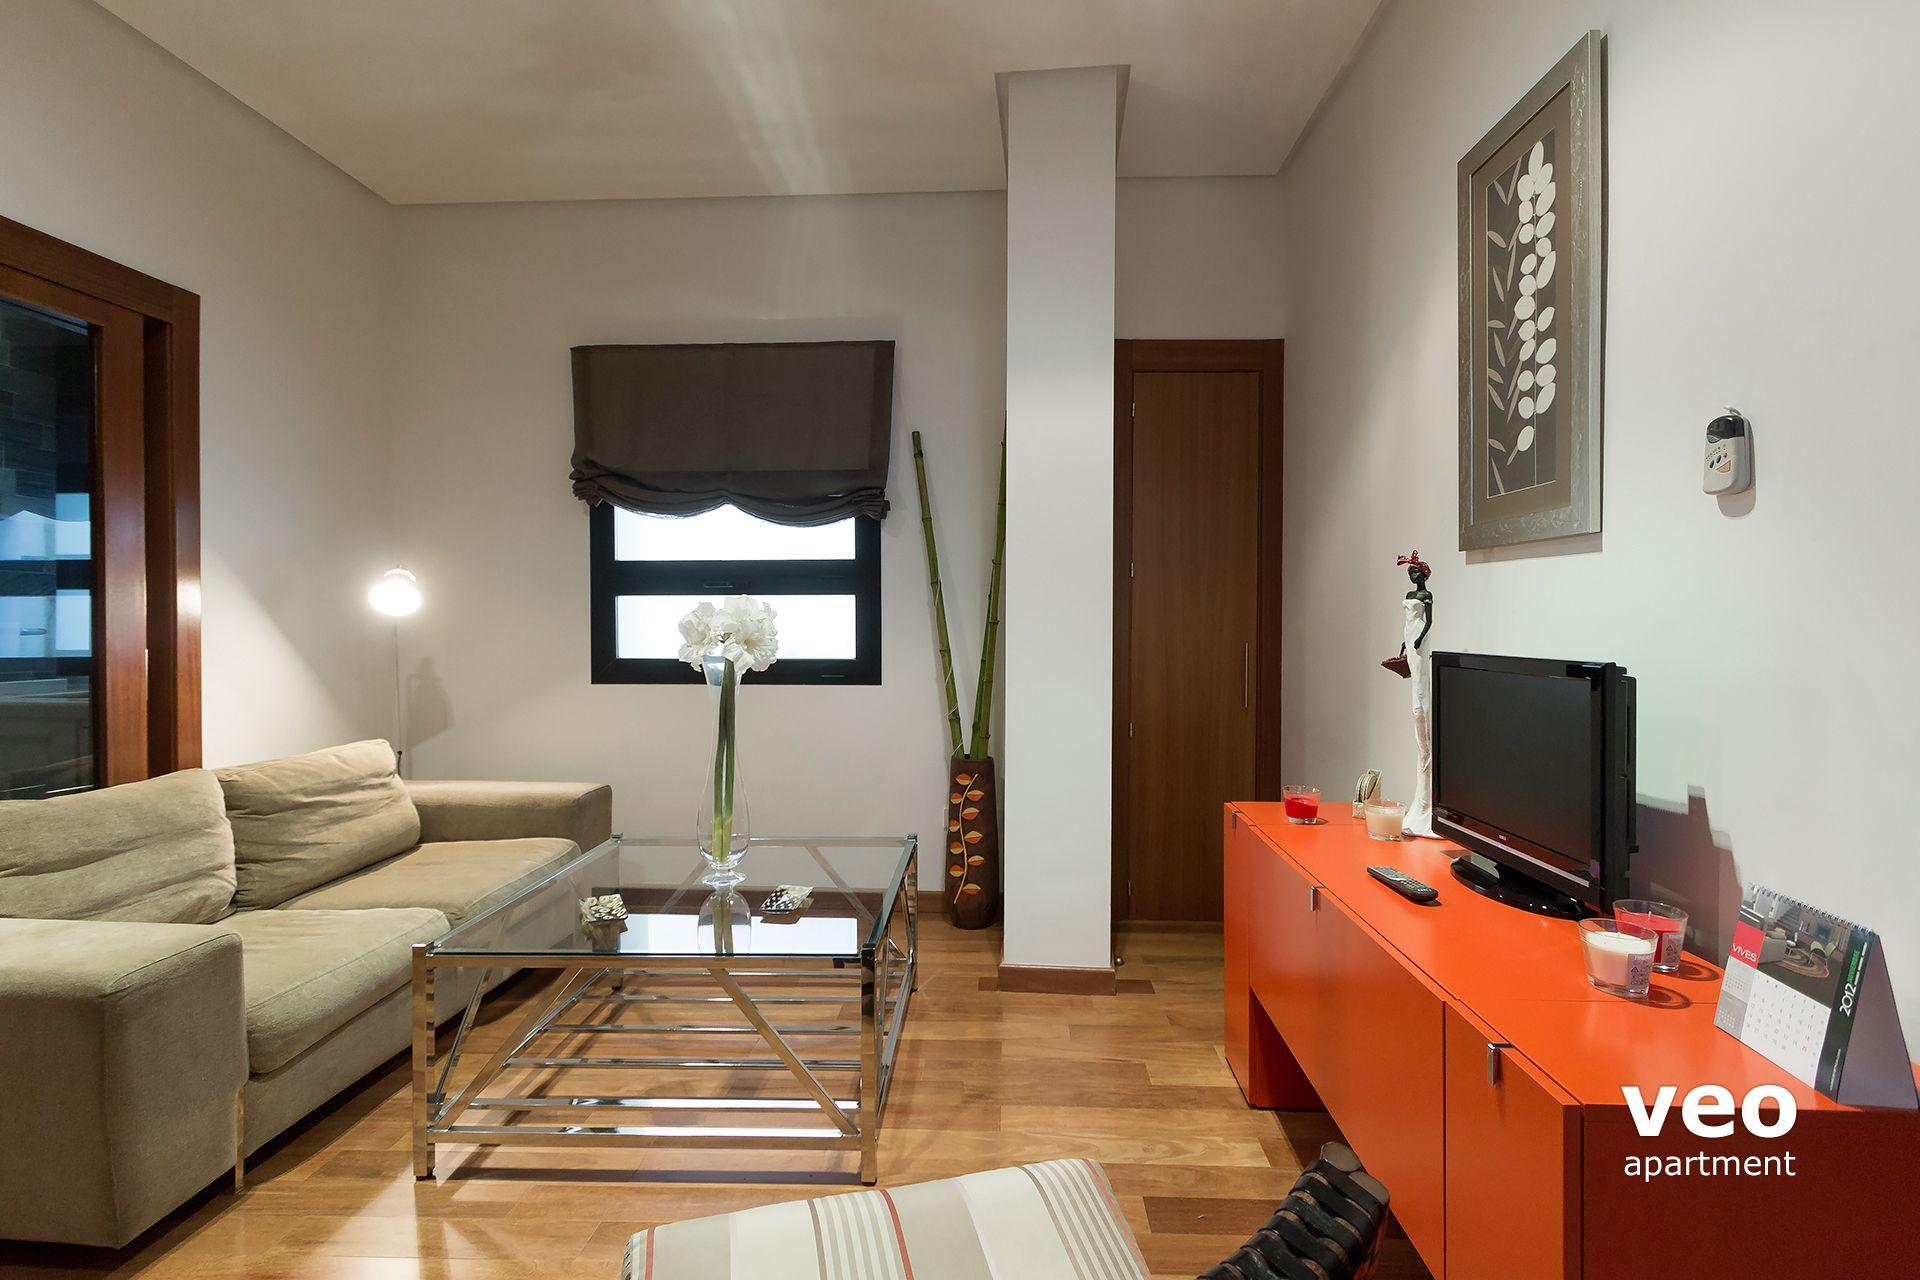 Separation Salon Chambre Studio seville apartment corral del rey street seville spain